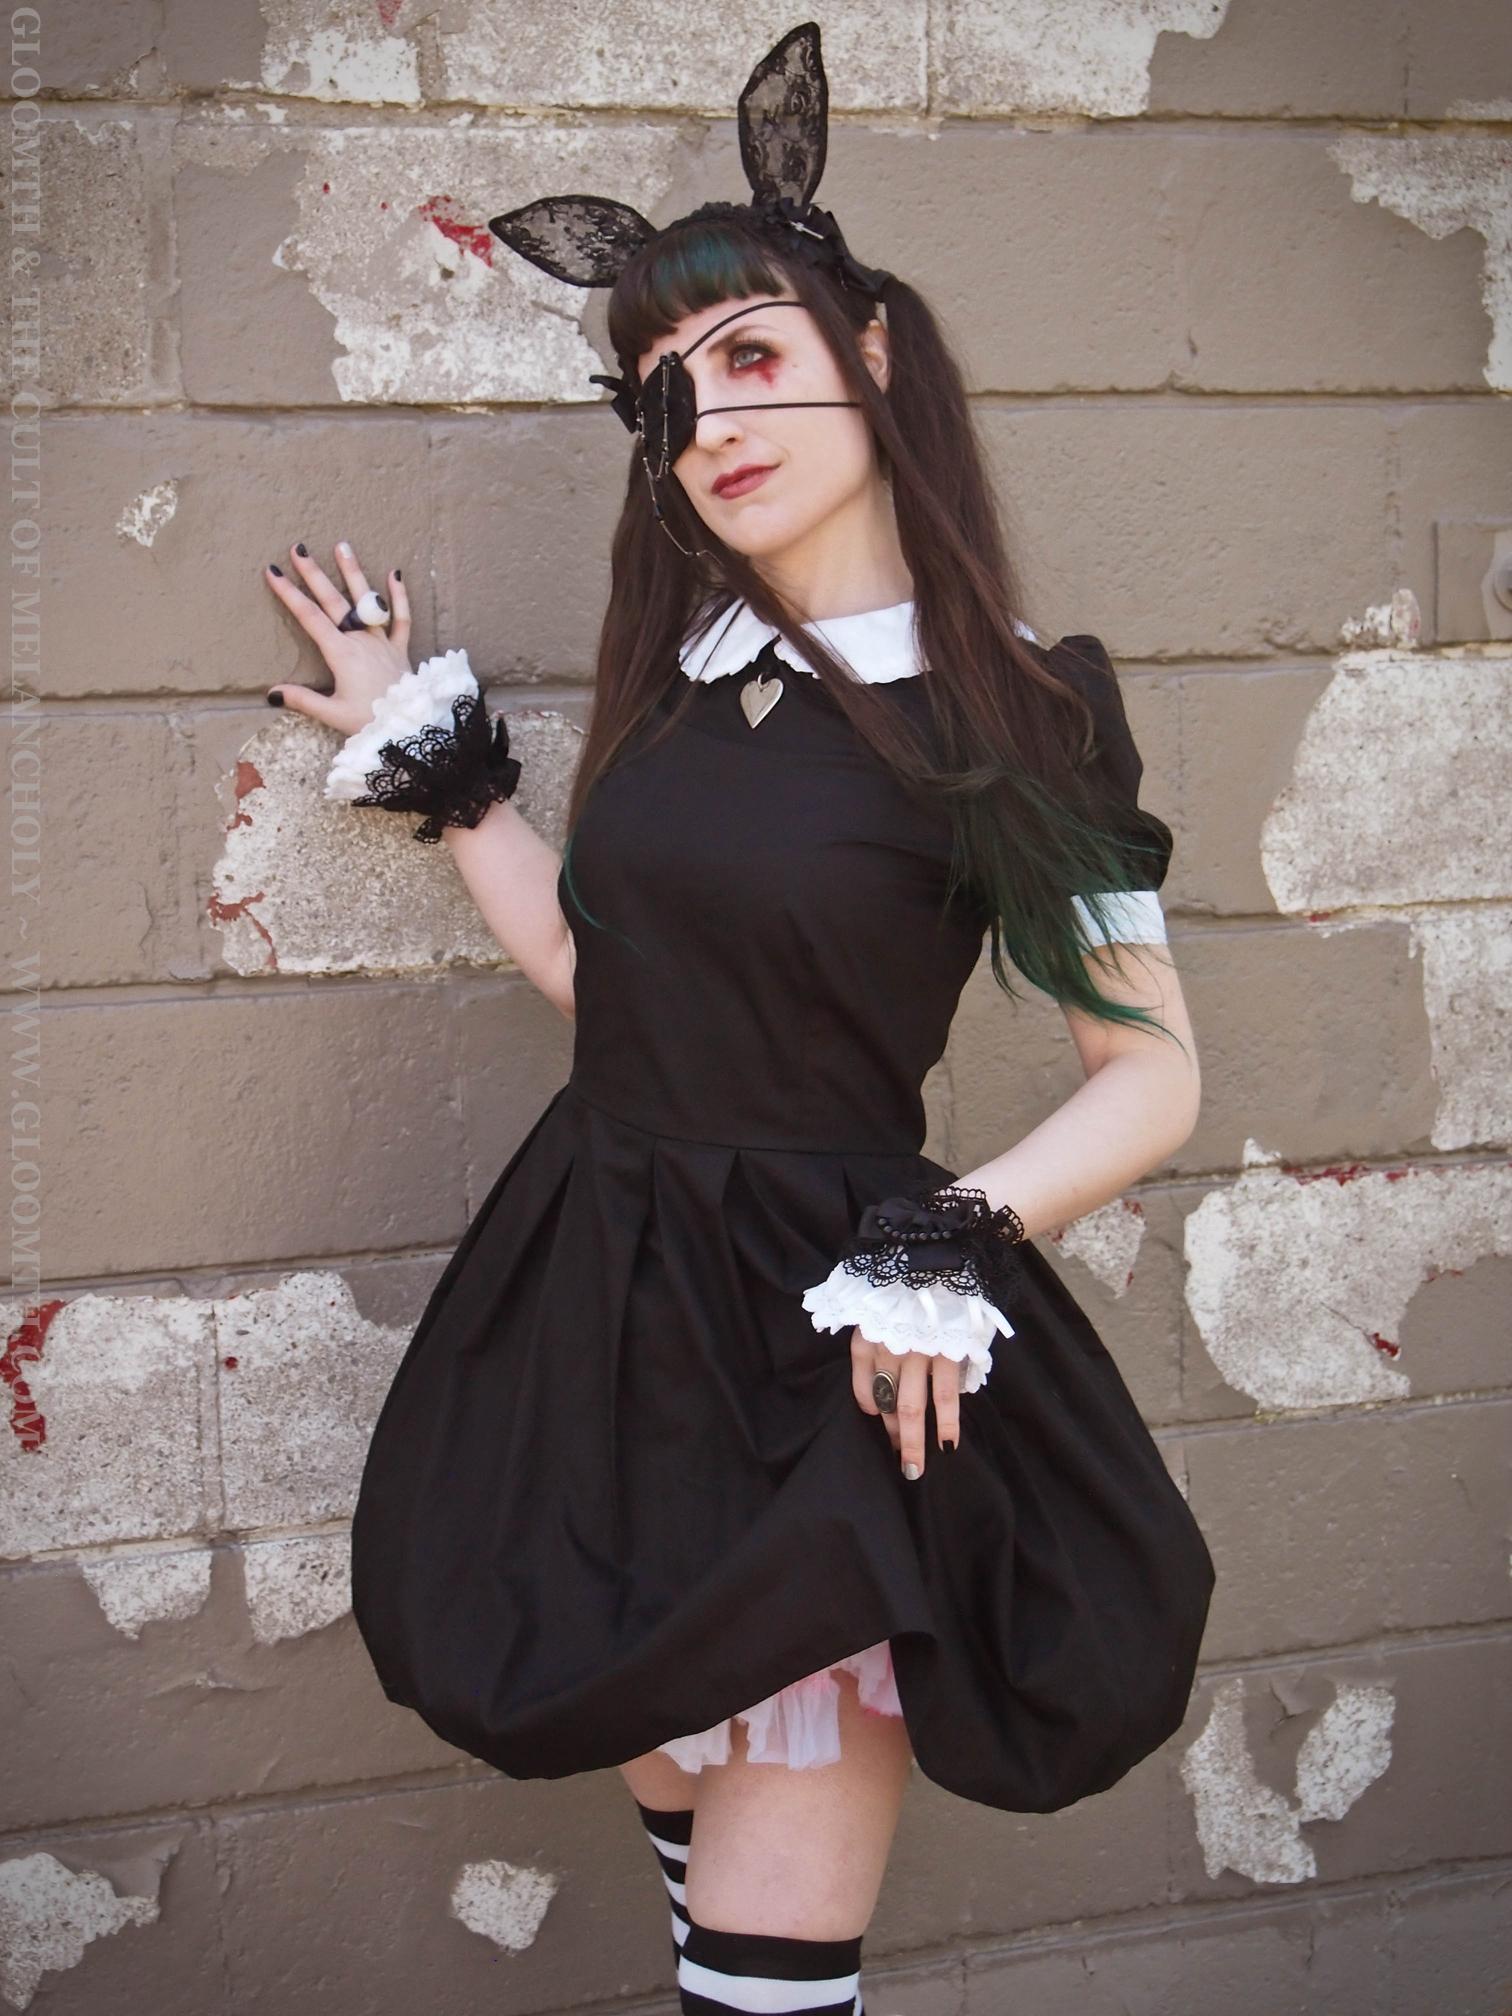 Last Minute DIY Halloween Costume Ideas – Gloomth & the Cult of